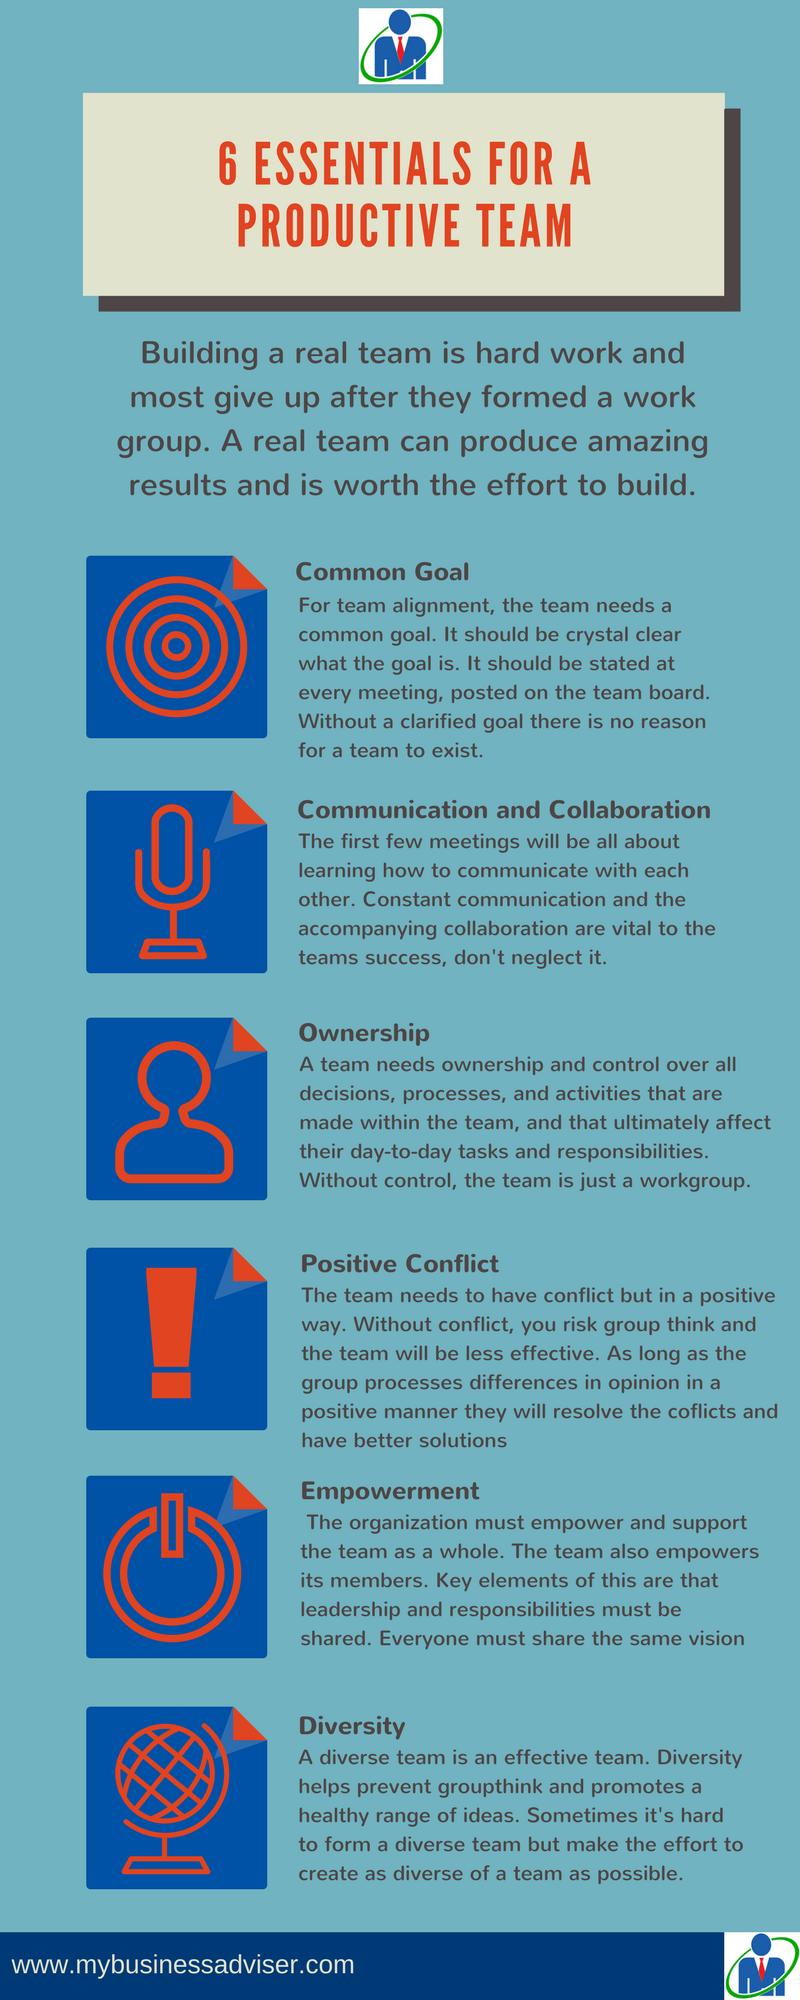 Team - 6 Essentials for a productive team